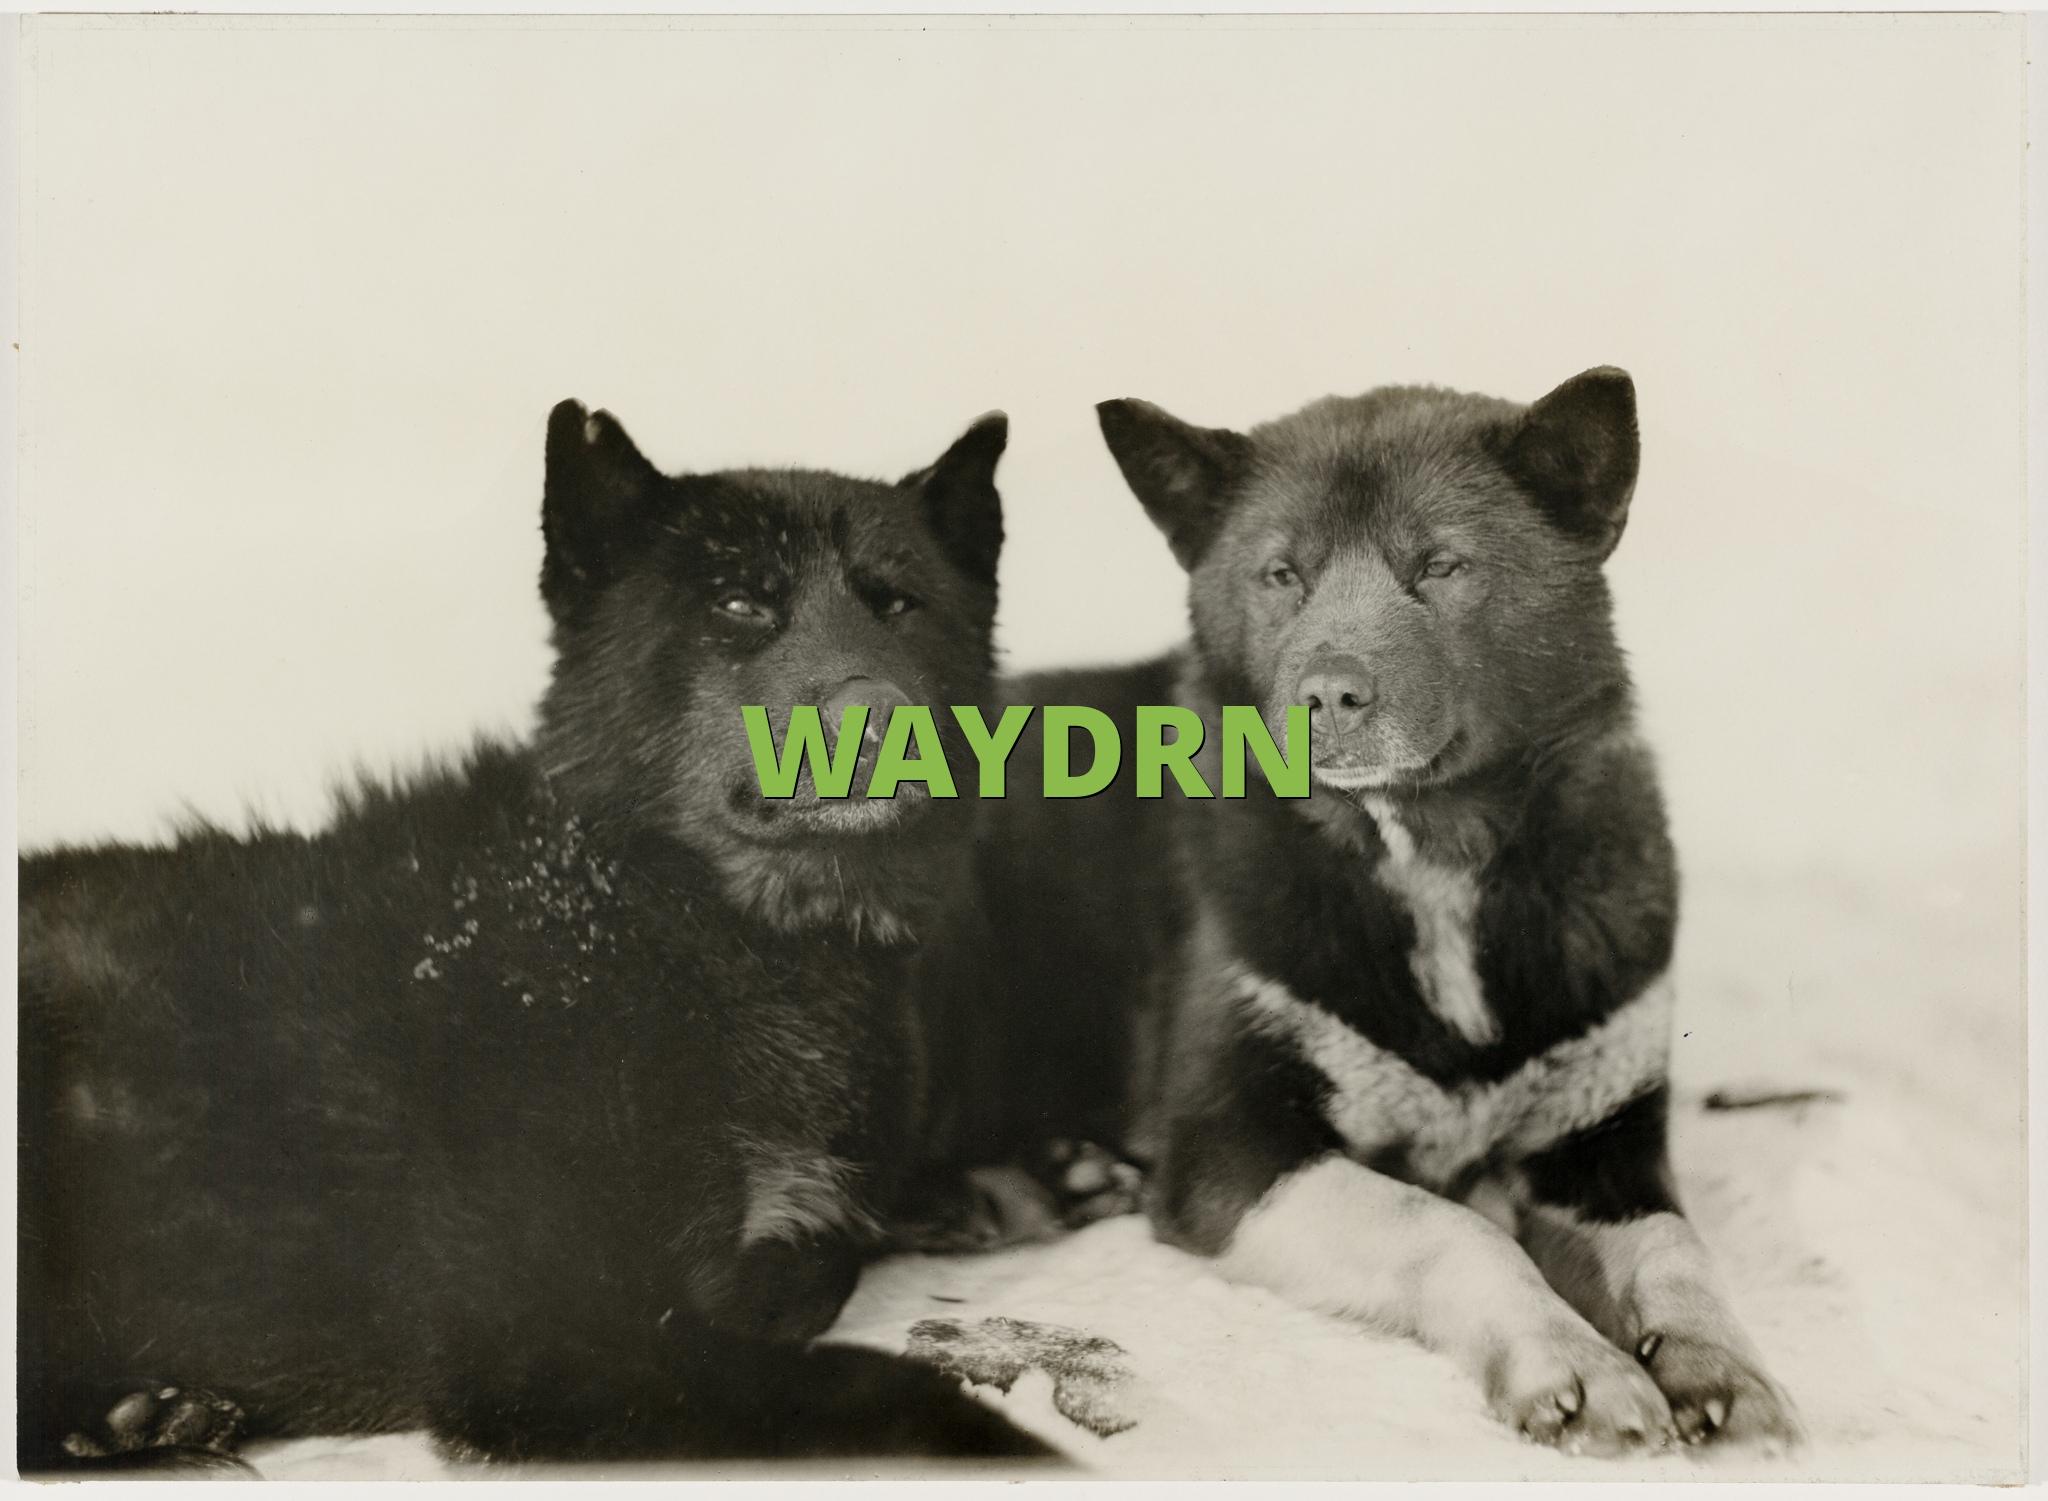 WAYDRN